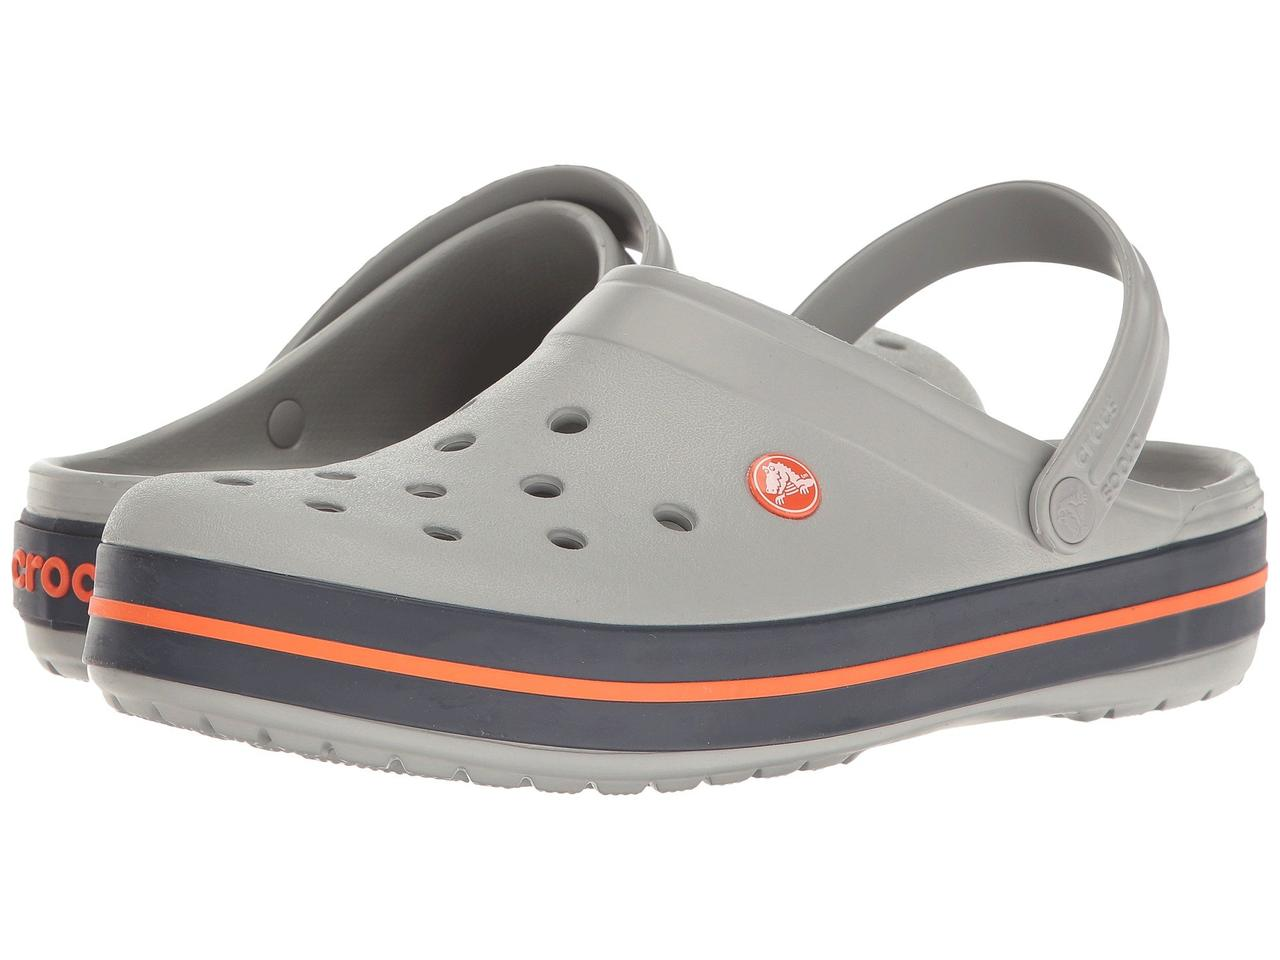 Сабо (Оригинал) Crocs Crocband Clog Light Grey Navy - TopUSA